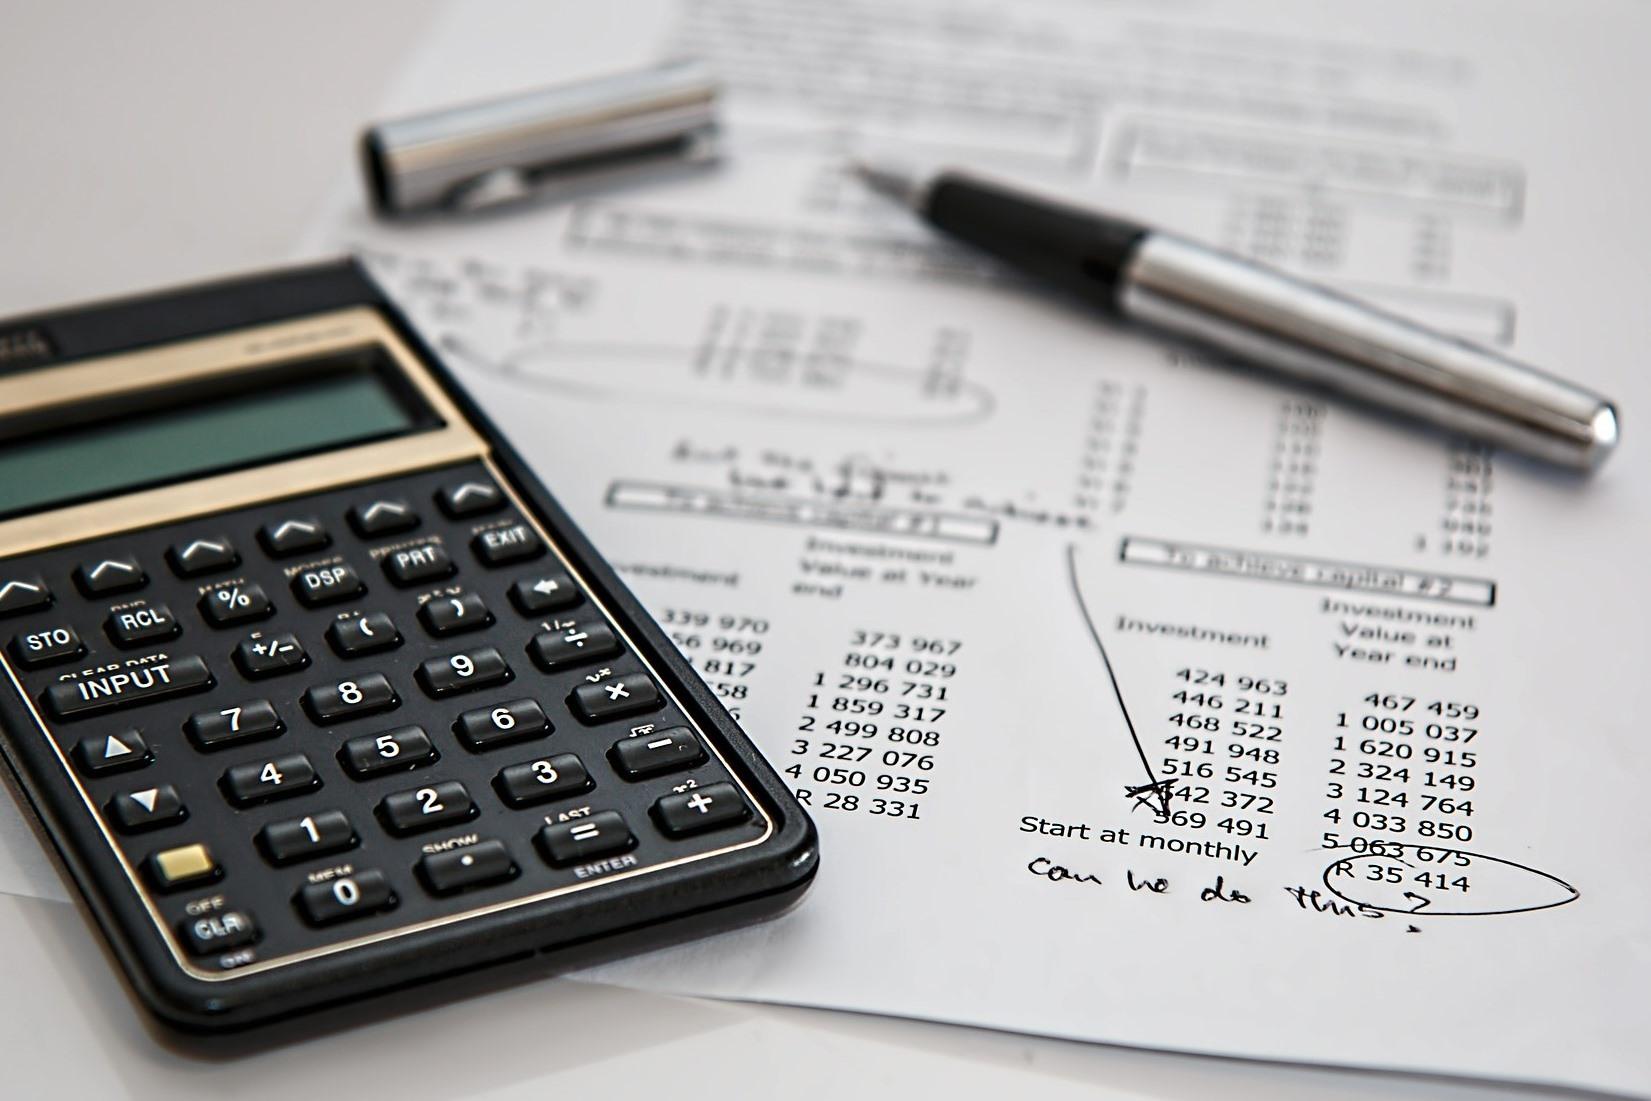 Calclulator and financial paperwork